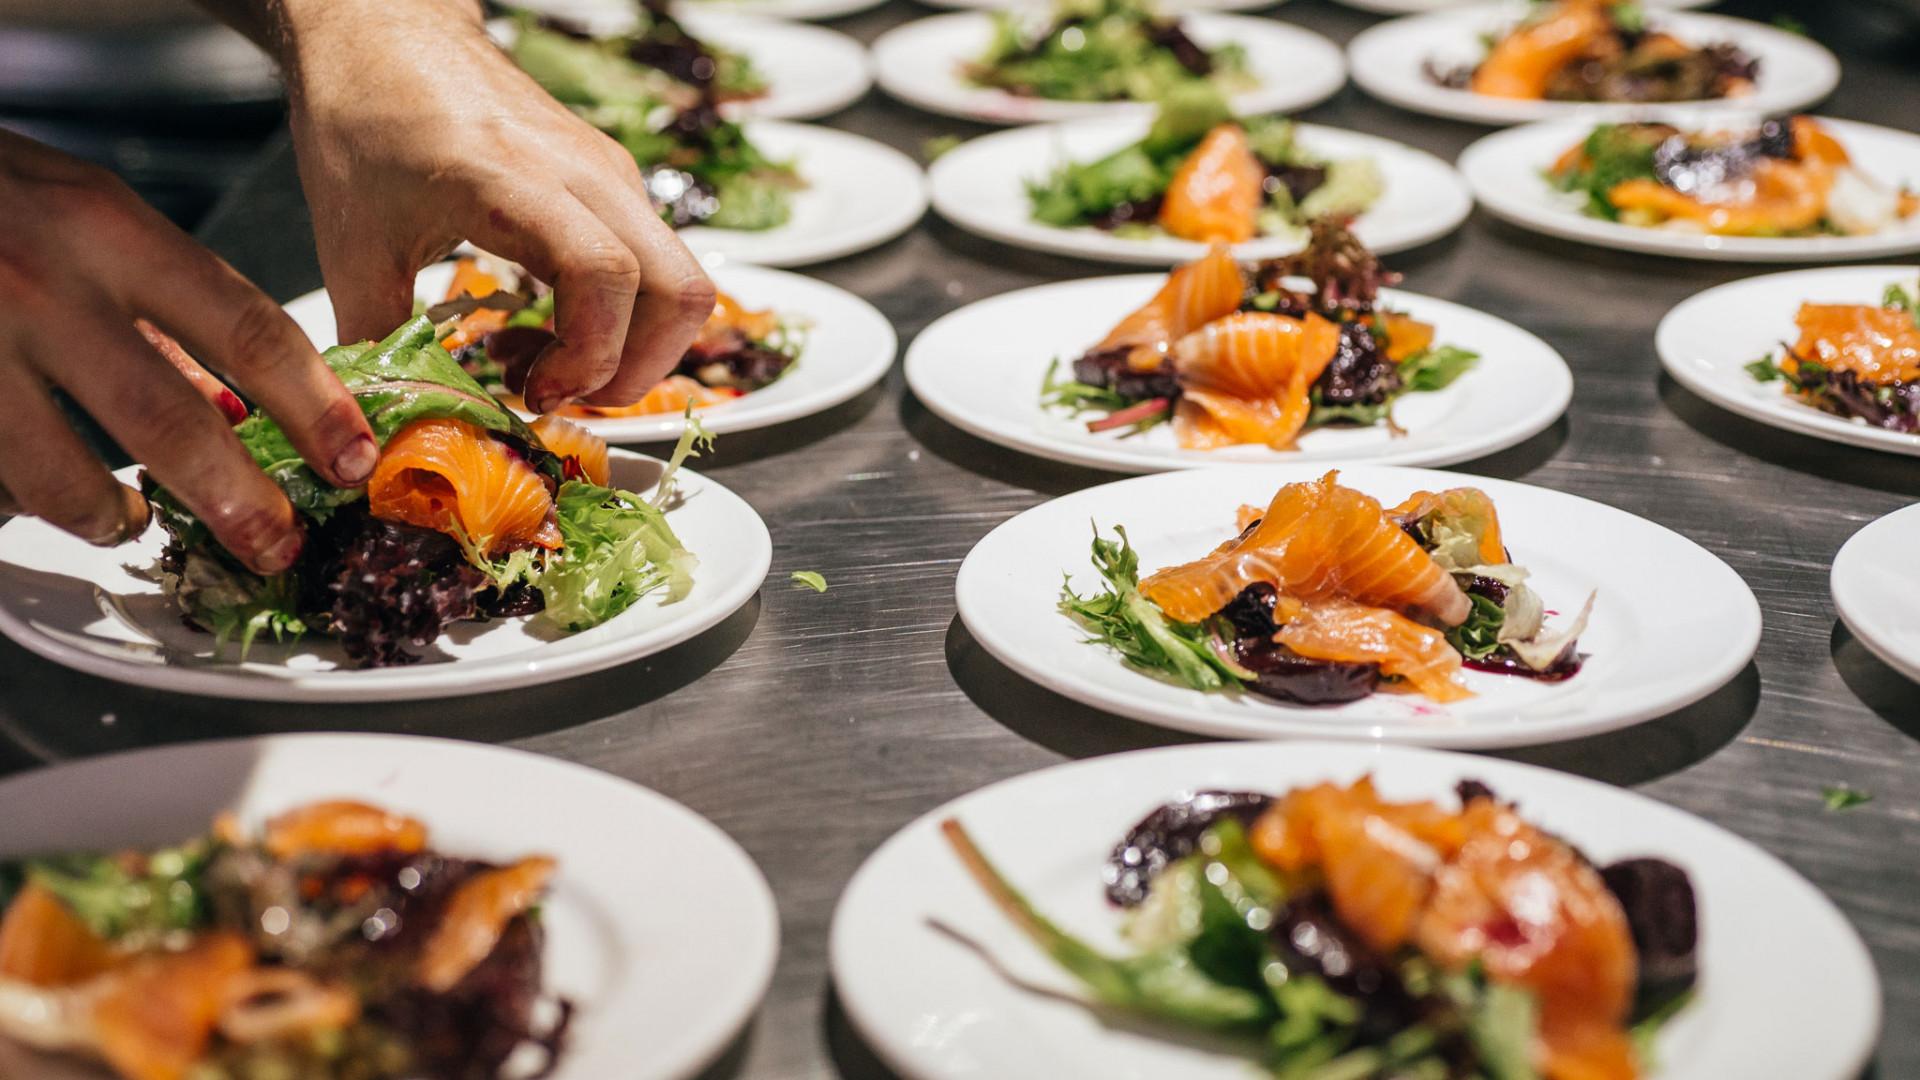 A banquet dish